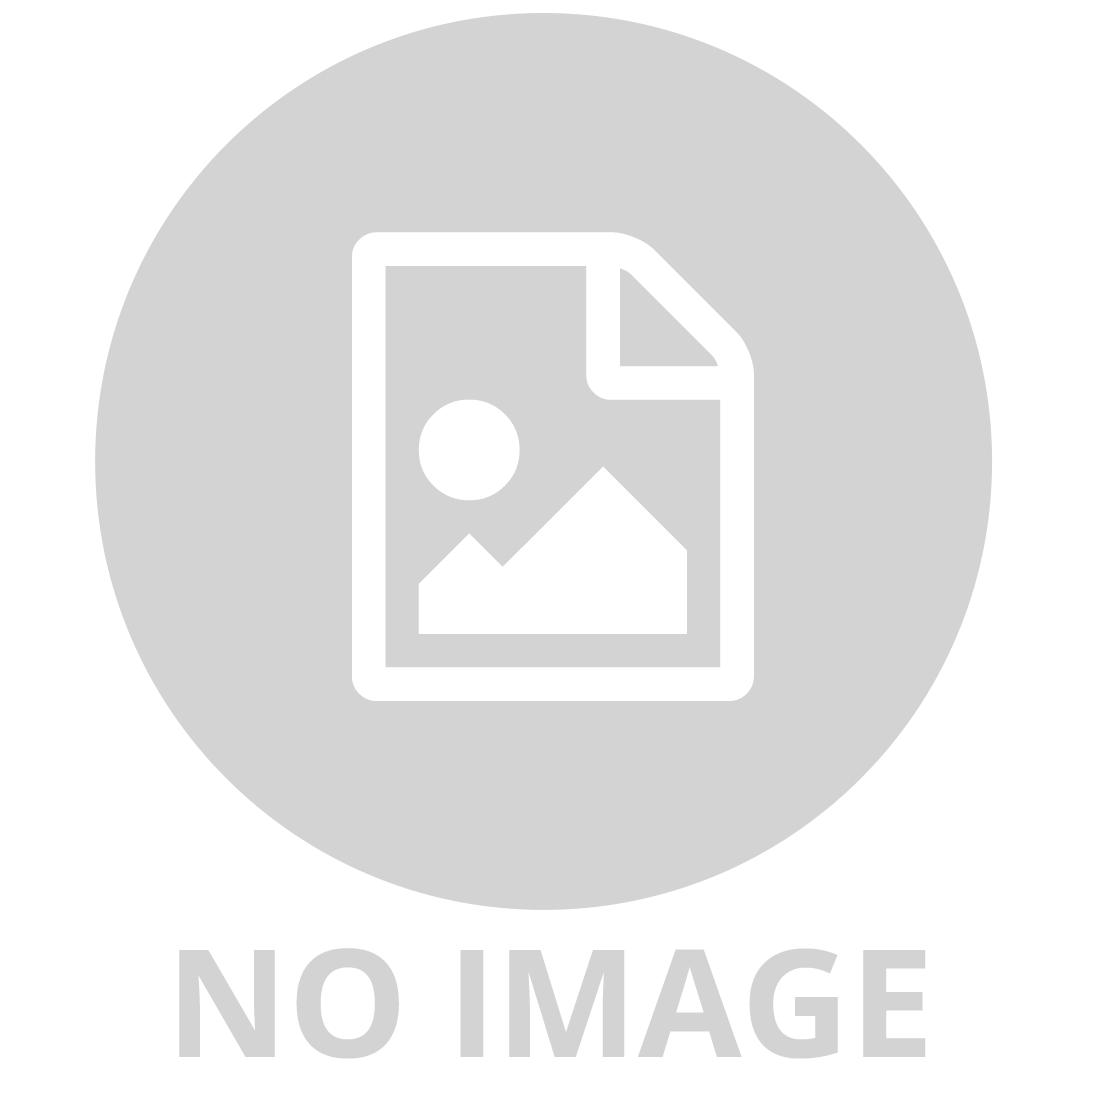 CRAYOLA 12 STICKS OF WHITE CHALK